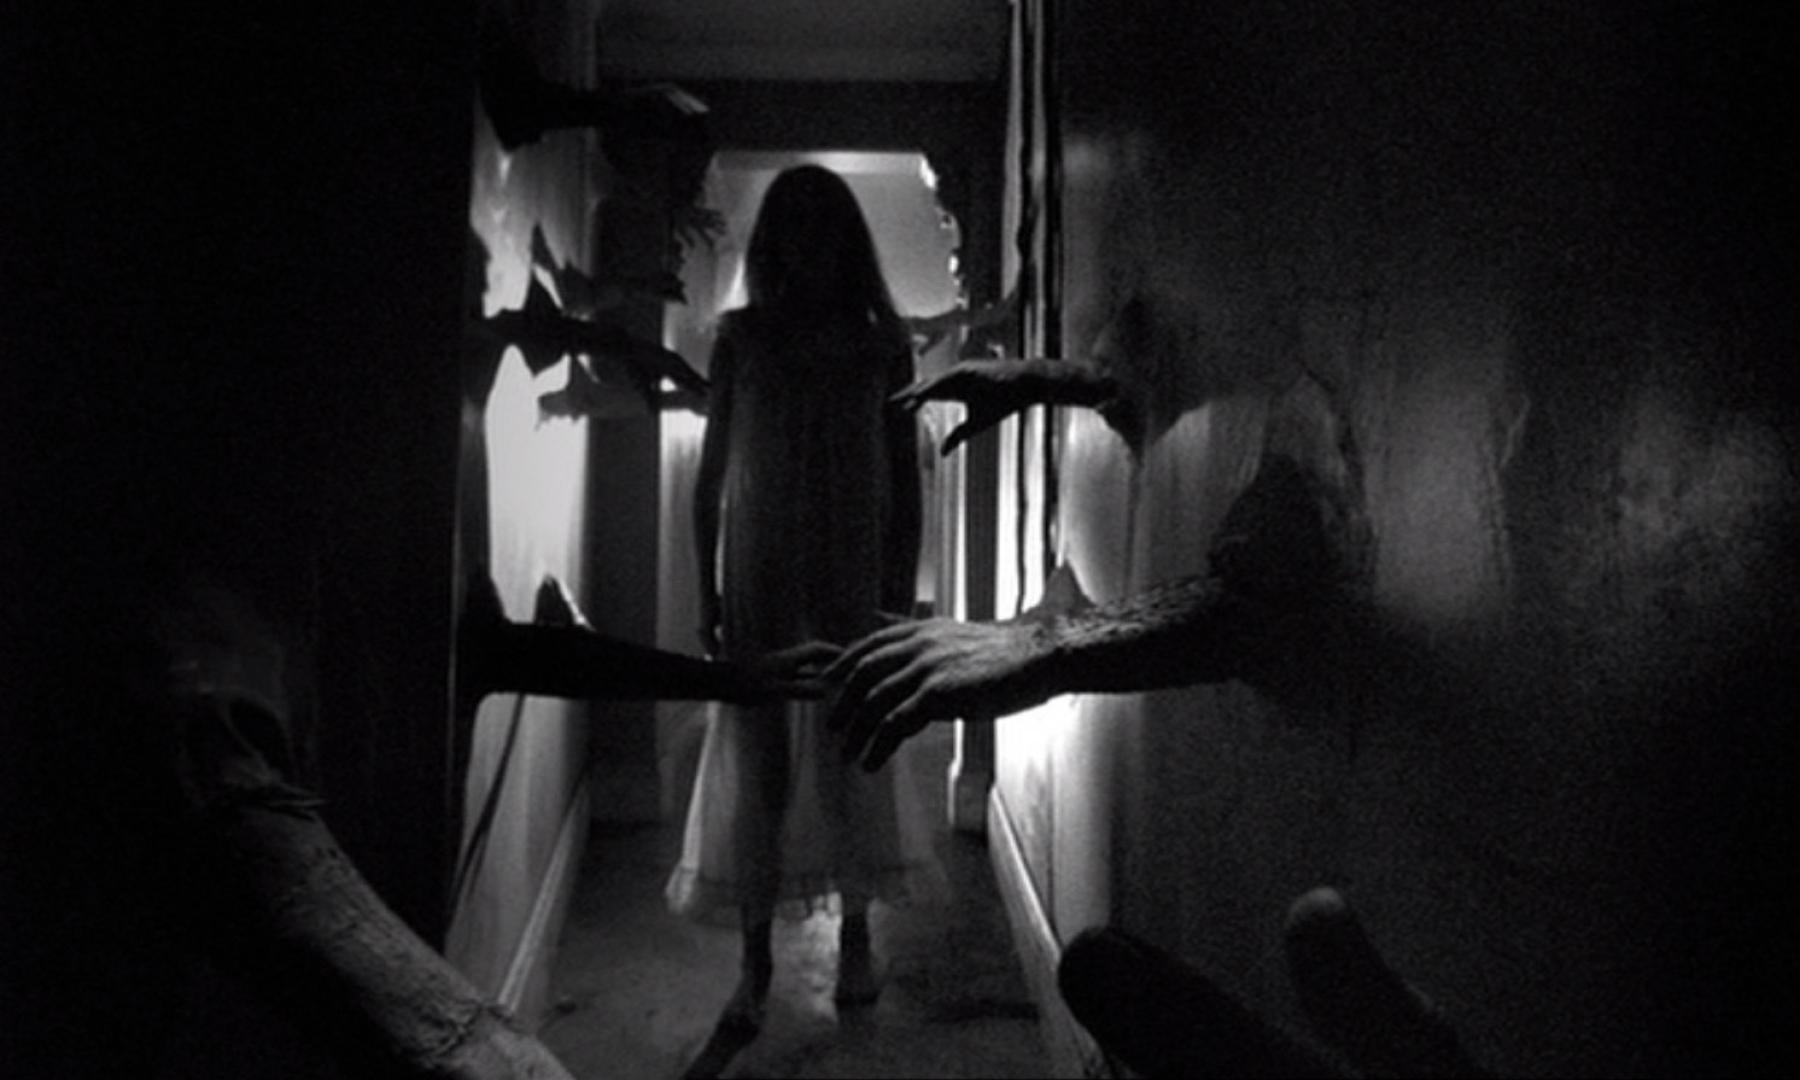 Repulsion - Iszonyat (1965) 2. kép